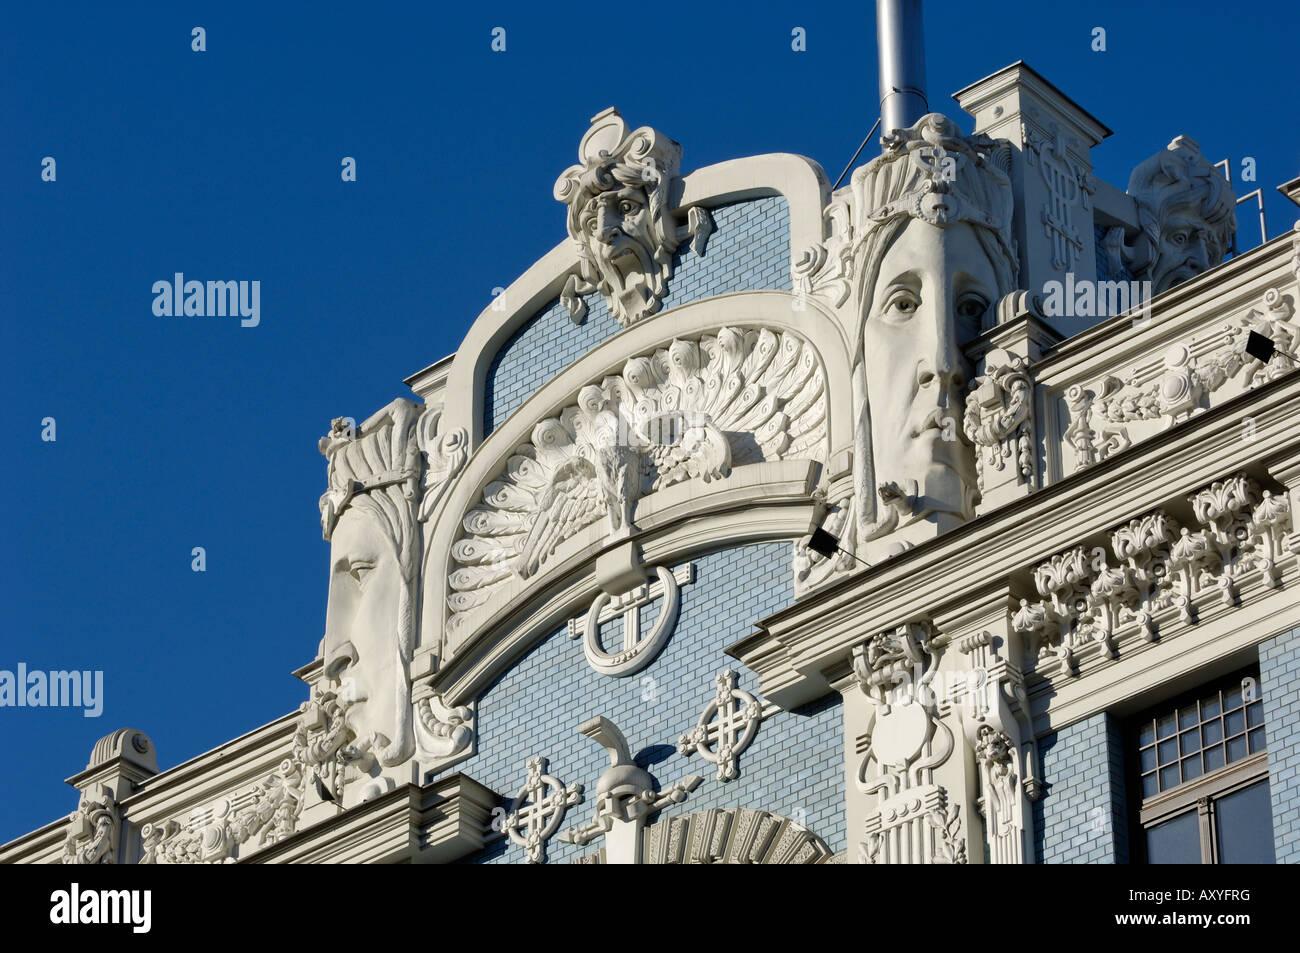 Art Nouveau architecture, 10b Elizabetes iela, designed by Mikhail Eisenstein, Riga, Latvia, Baltic States, Europe - Stock Image